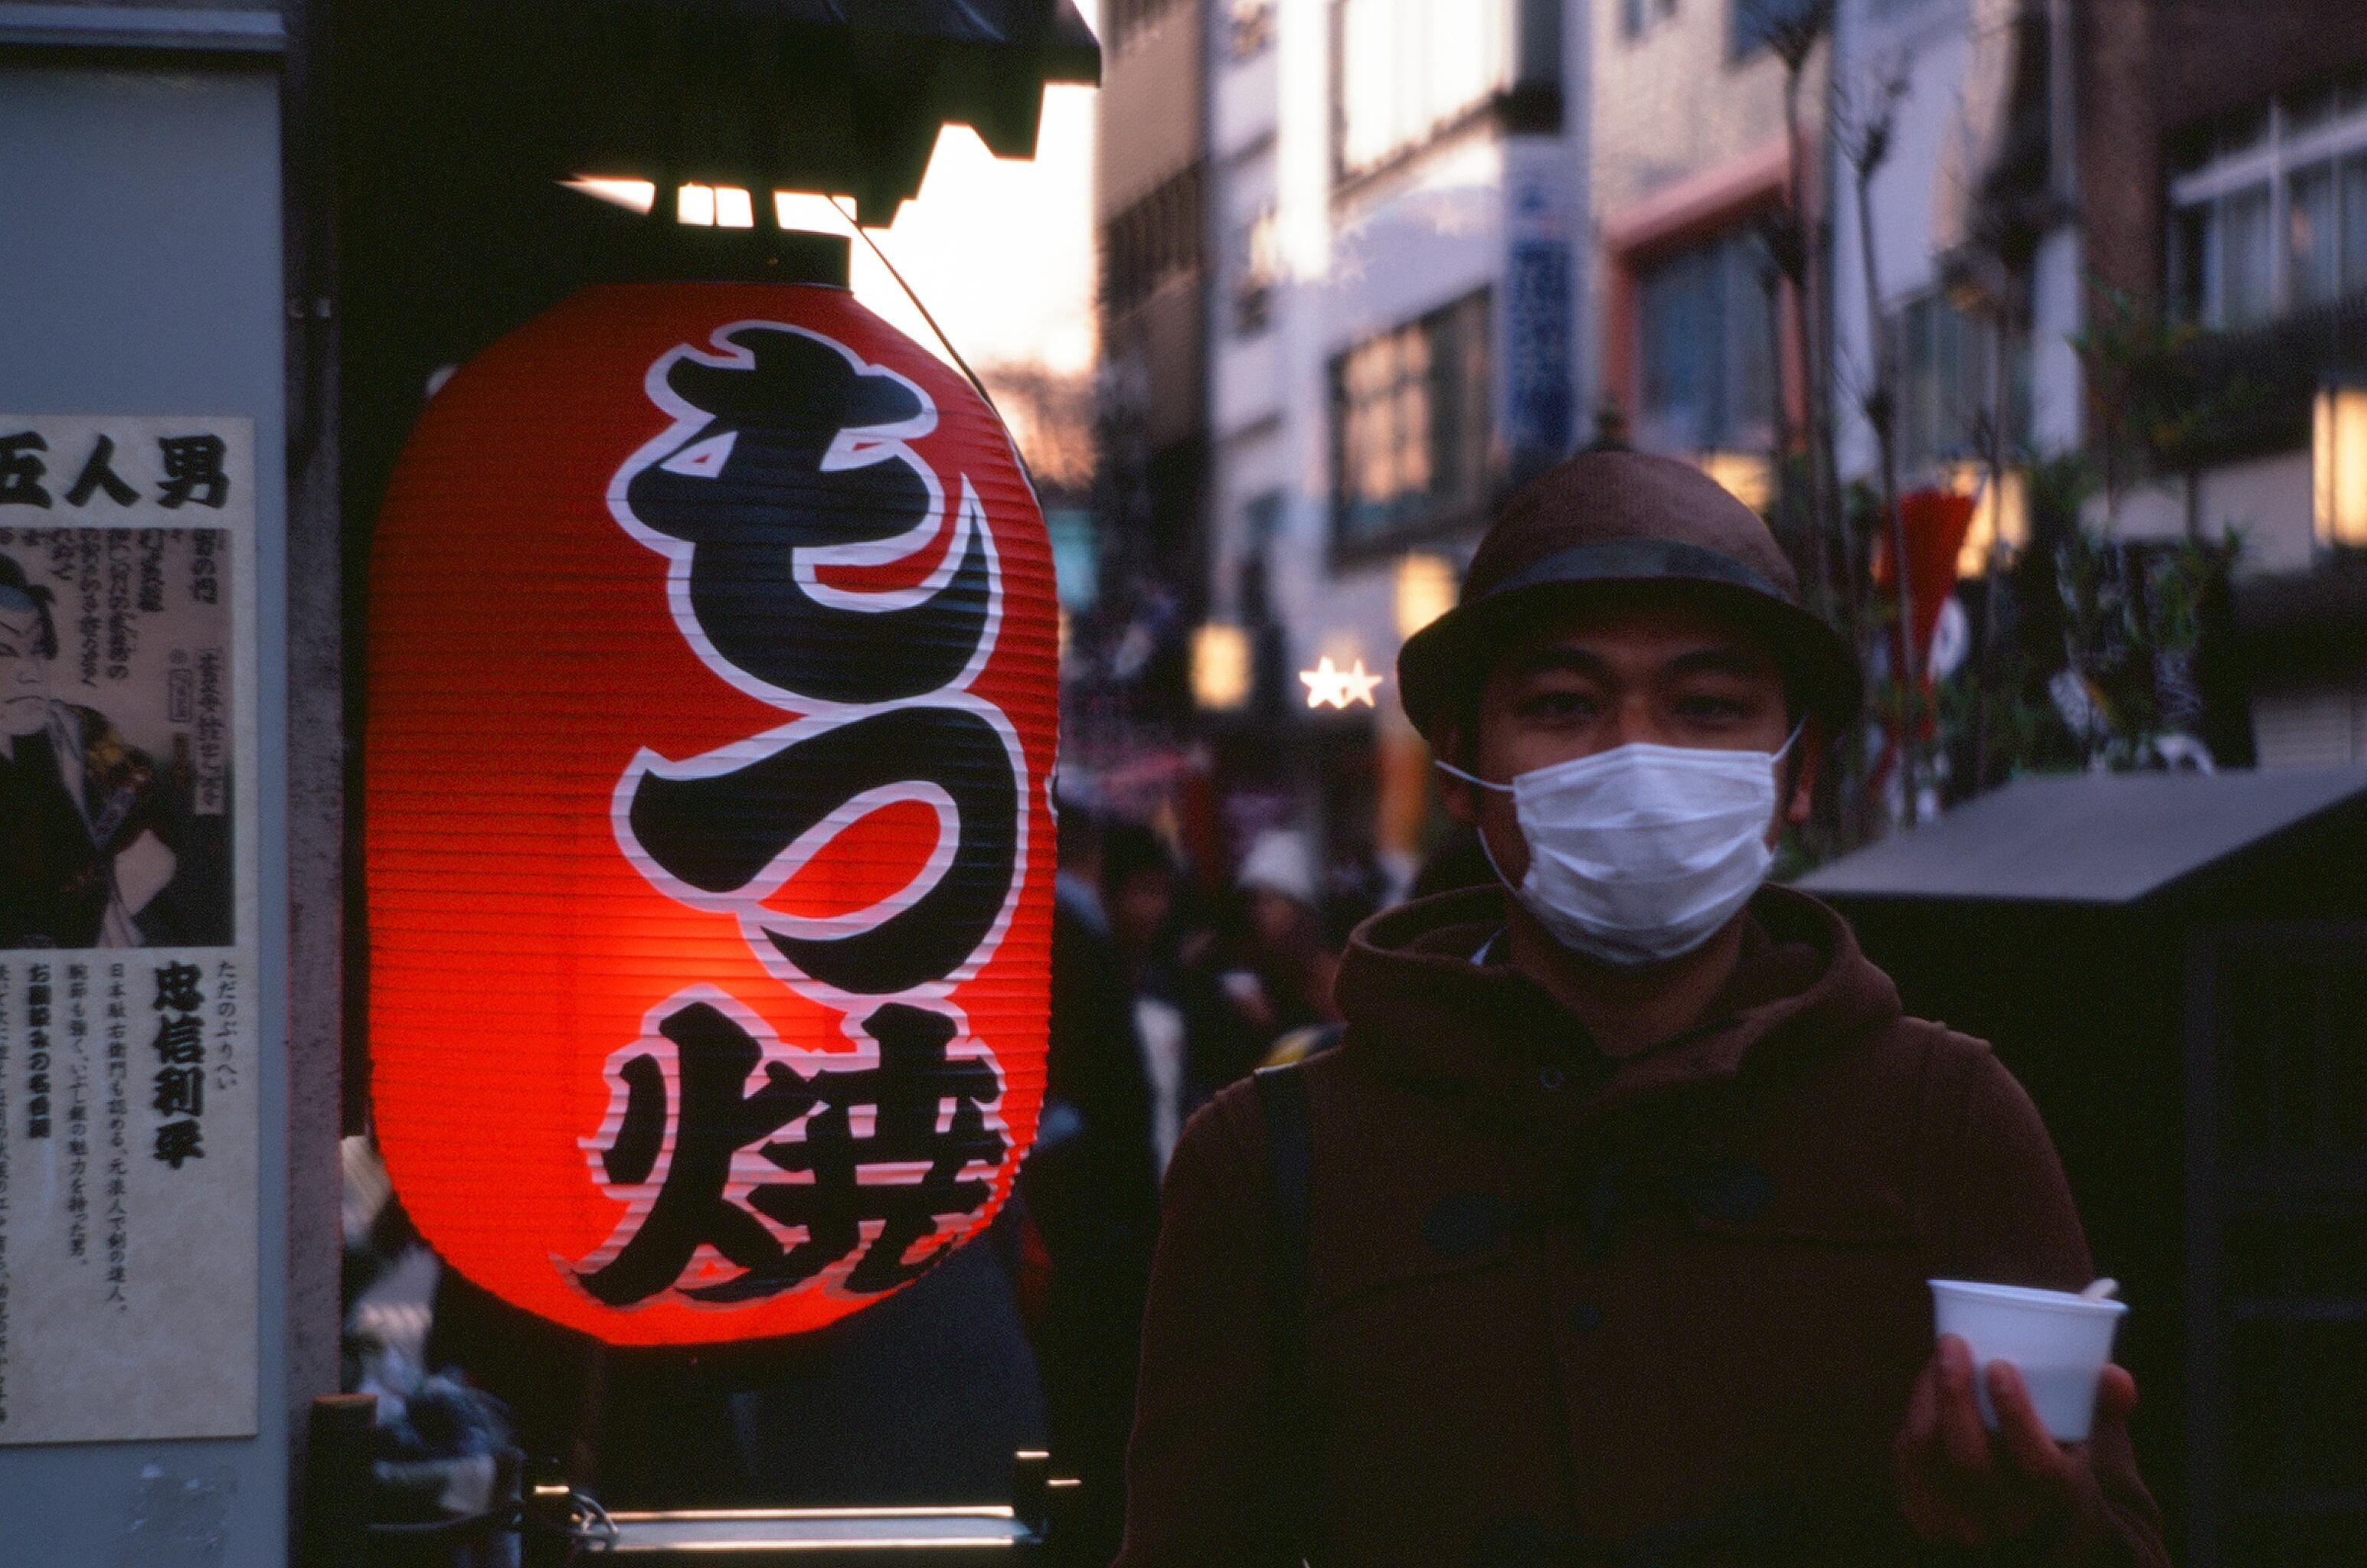 Wallpaper : street, new, old, Japan, dark, lens, Tokyo, lomo